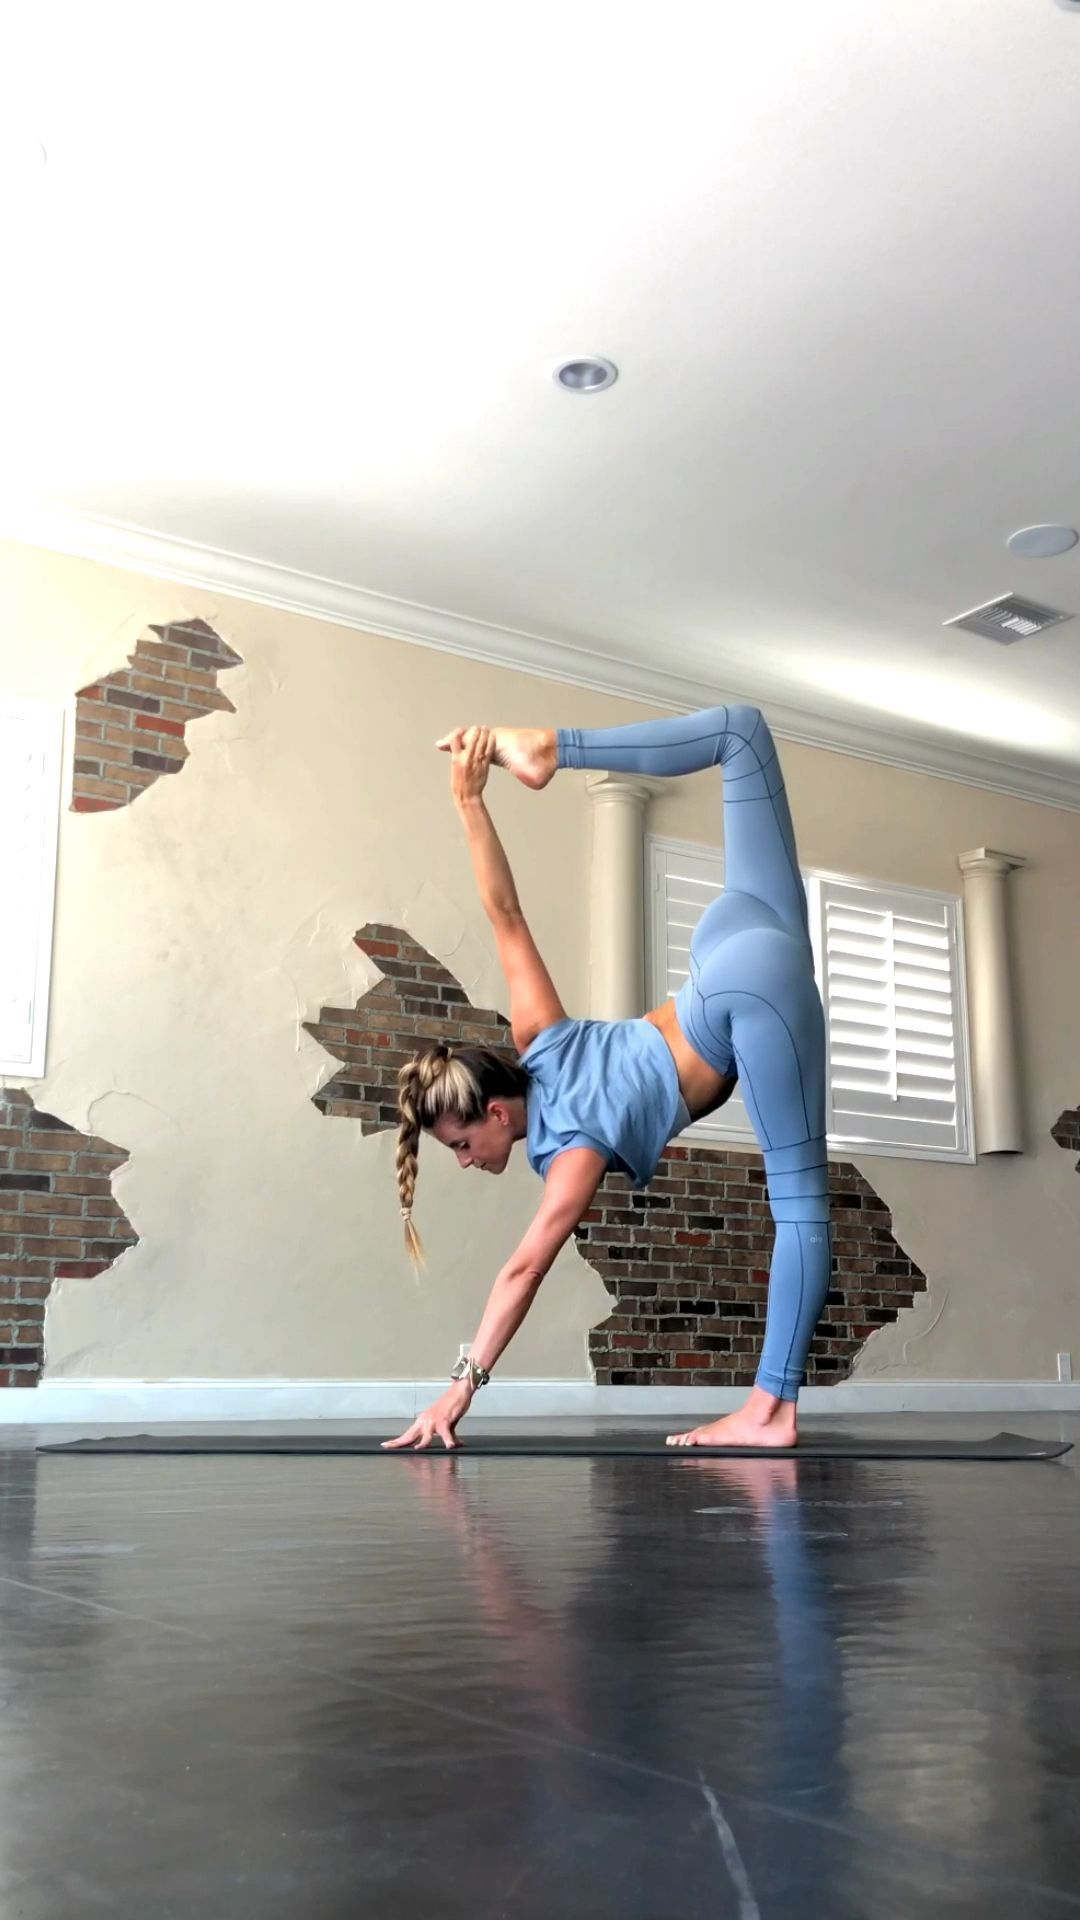 Flexibility Yoga Flow -  Splits flow. Let's stretch together. @yoga_ky #yoga #dancer #flexible  - #asana #Exercise #flexibility #Flow #Meditation #namaste #VinyasaYoga #YinYoga #Yoga #YogaFitness #YogaFlow #Yogagirls #YogaLifestyle #Yogaposes #YogaSequences